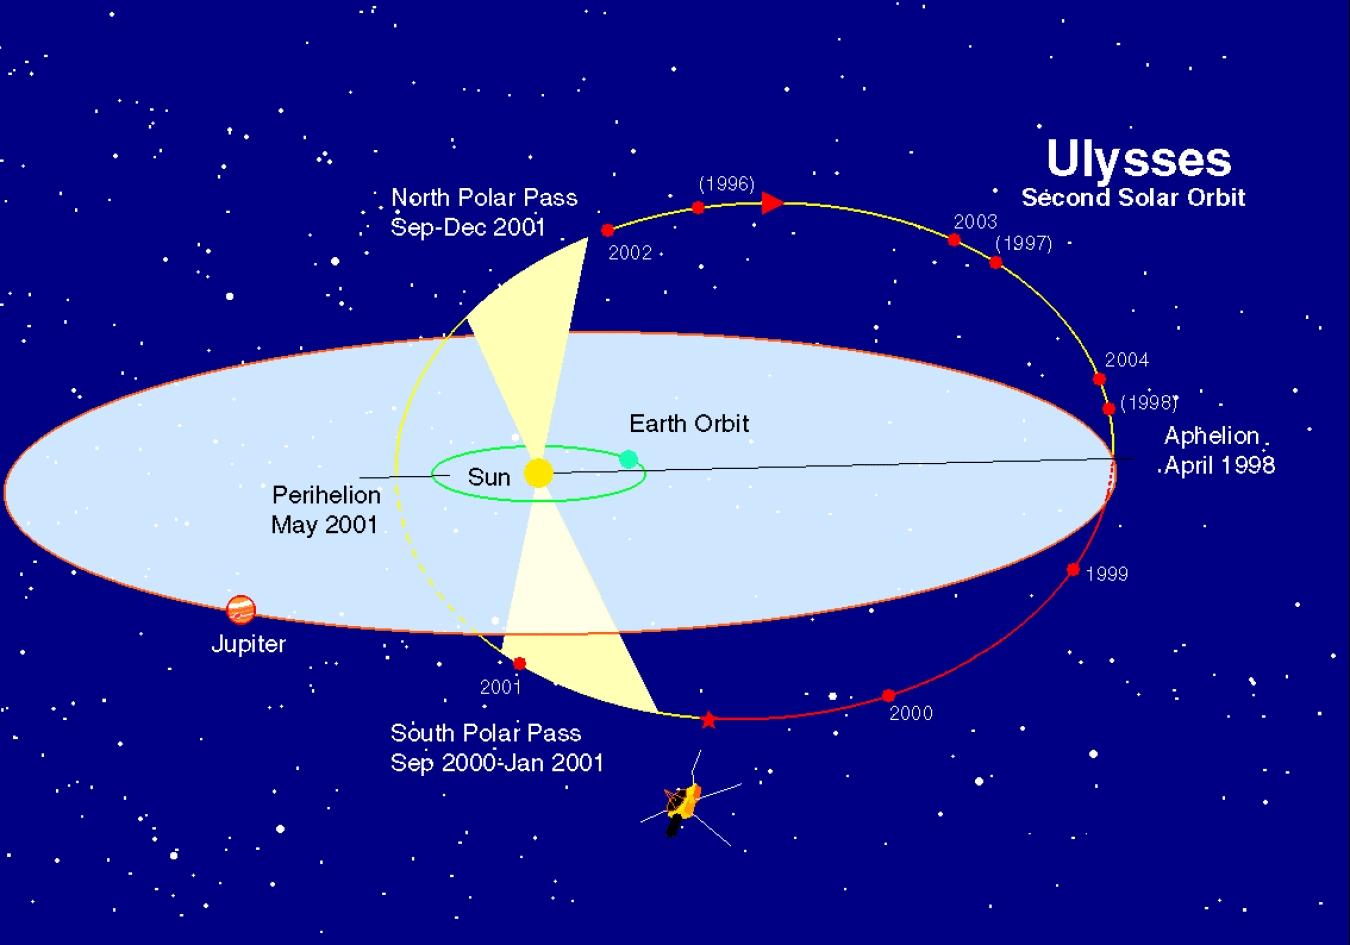 1567219253379-Ulysses-Orbit-2.jpg